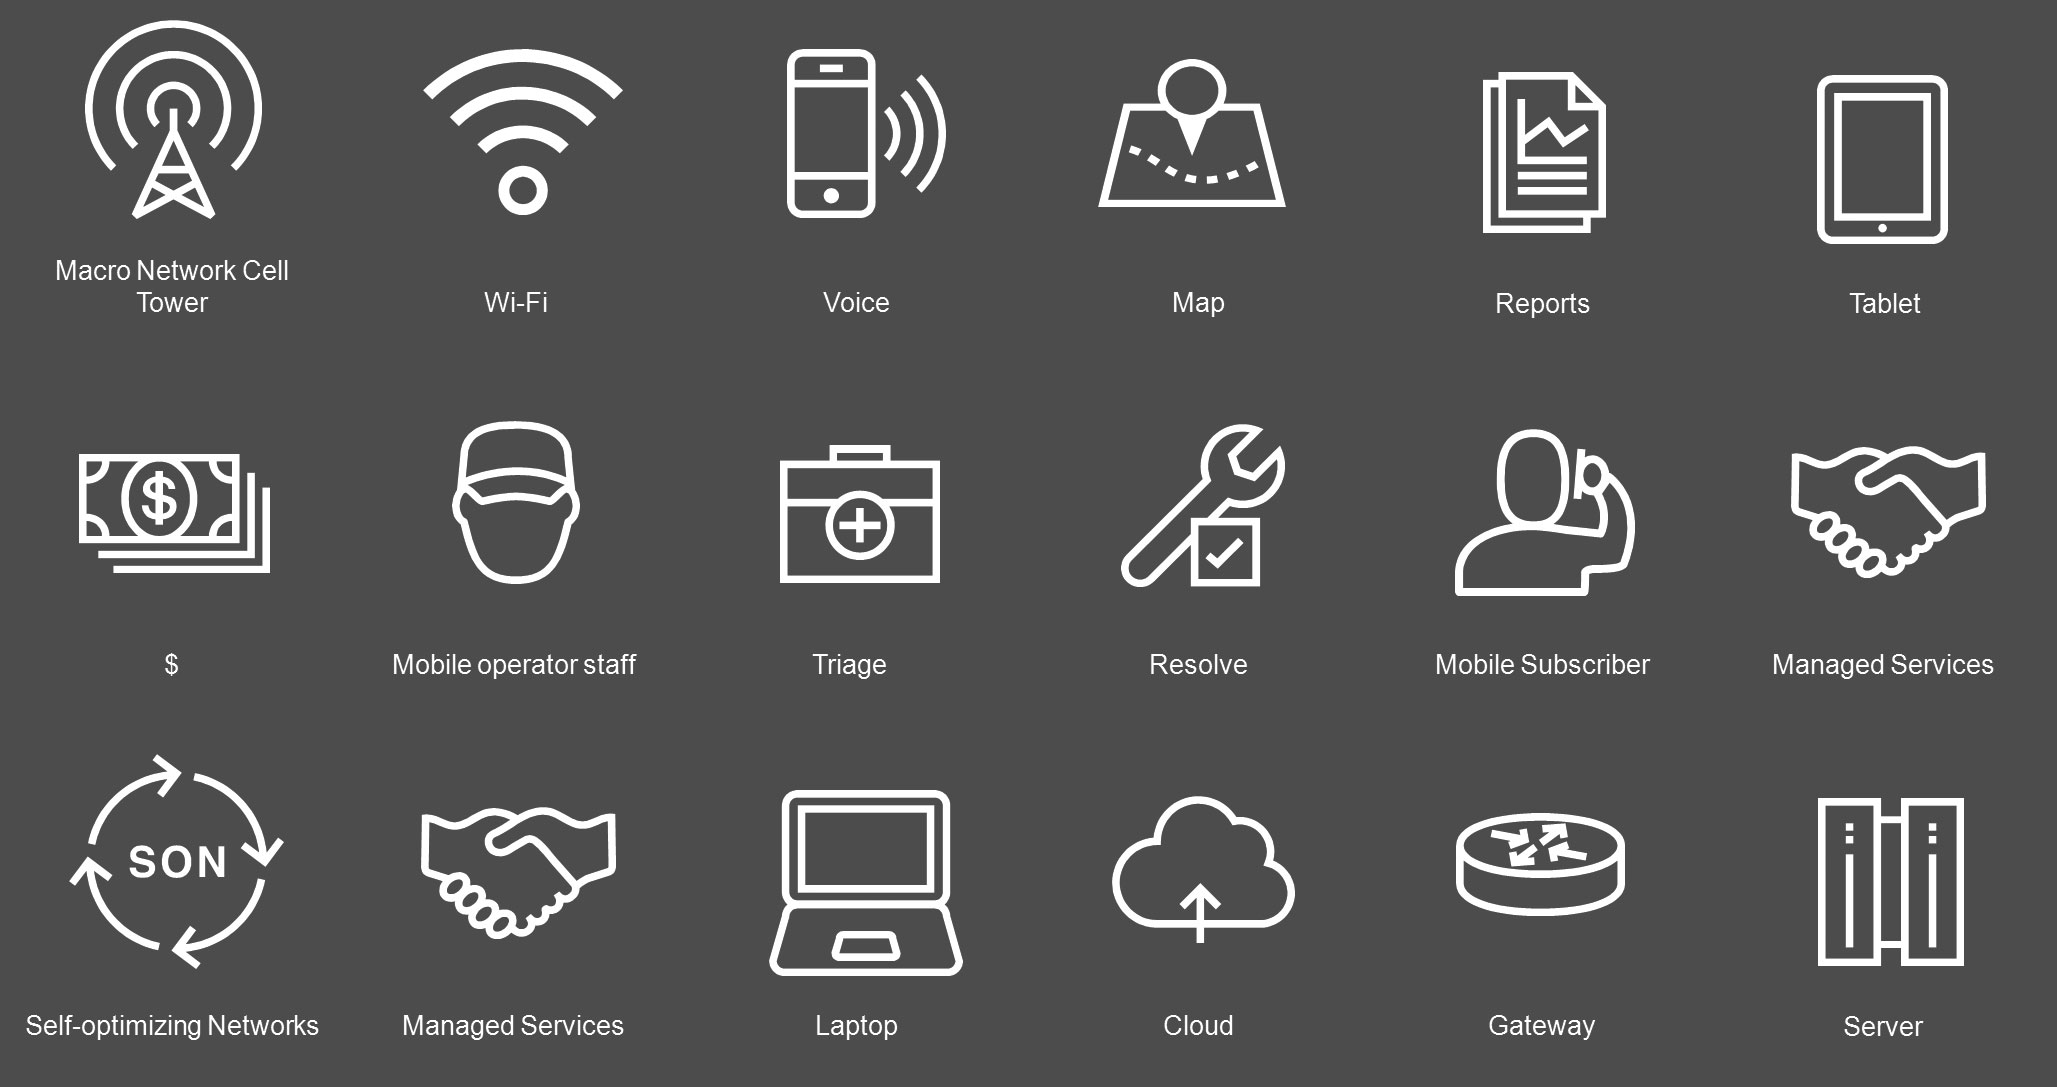 amdocs icons